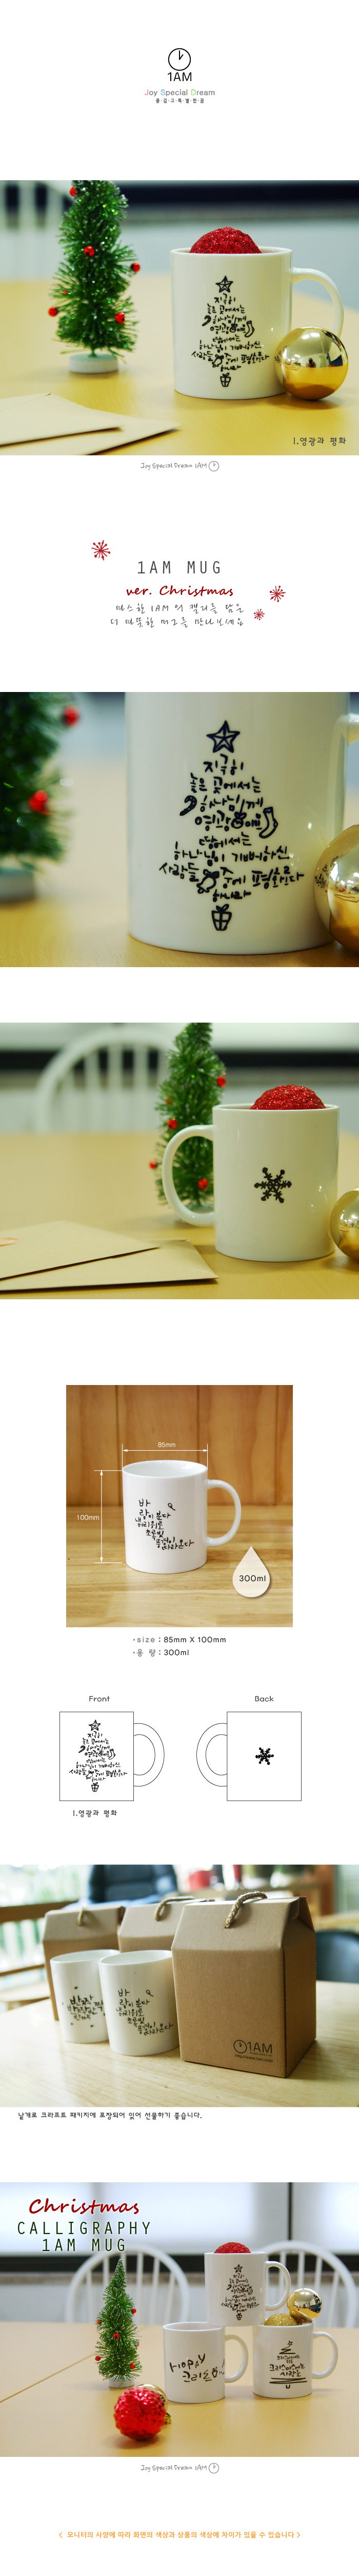 1AM 캘리그라피 크리스마스 머그컵 - 1.영광 and 평화 - 1AM, 7,000원, 머그컵, 기념일머그